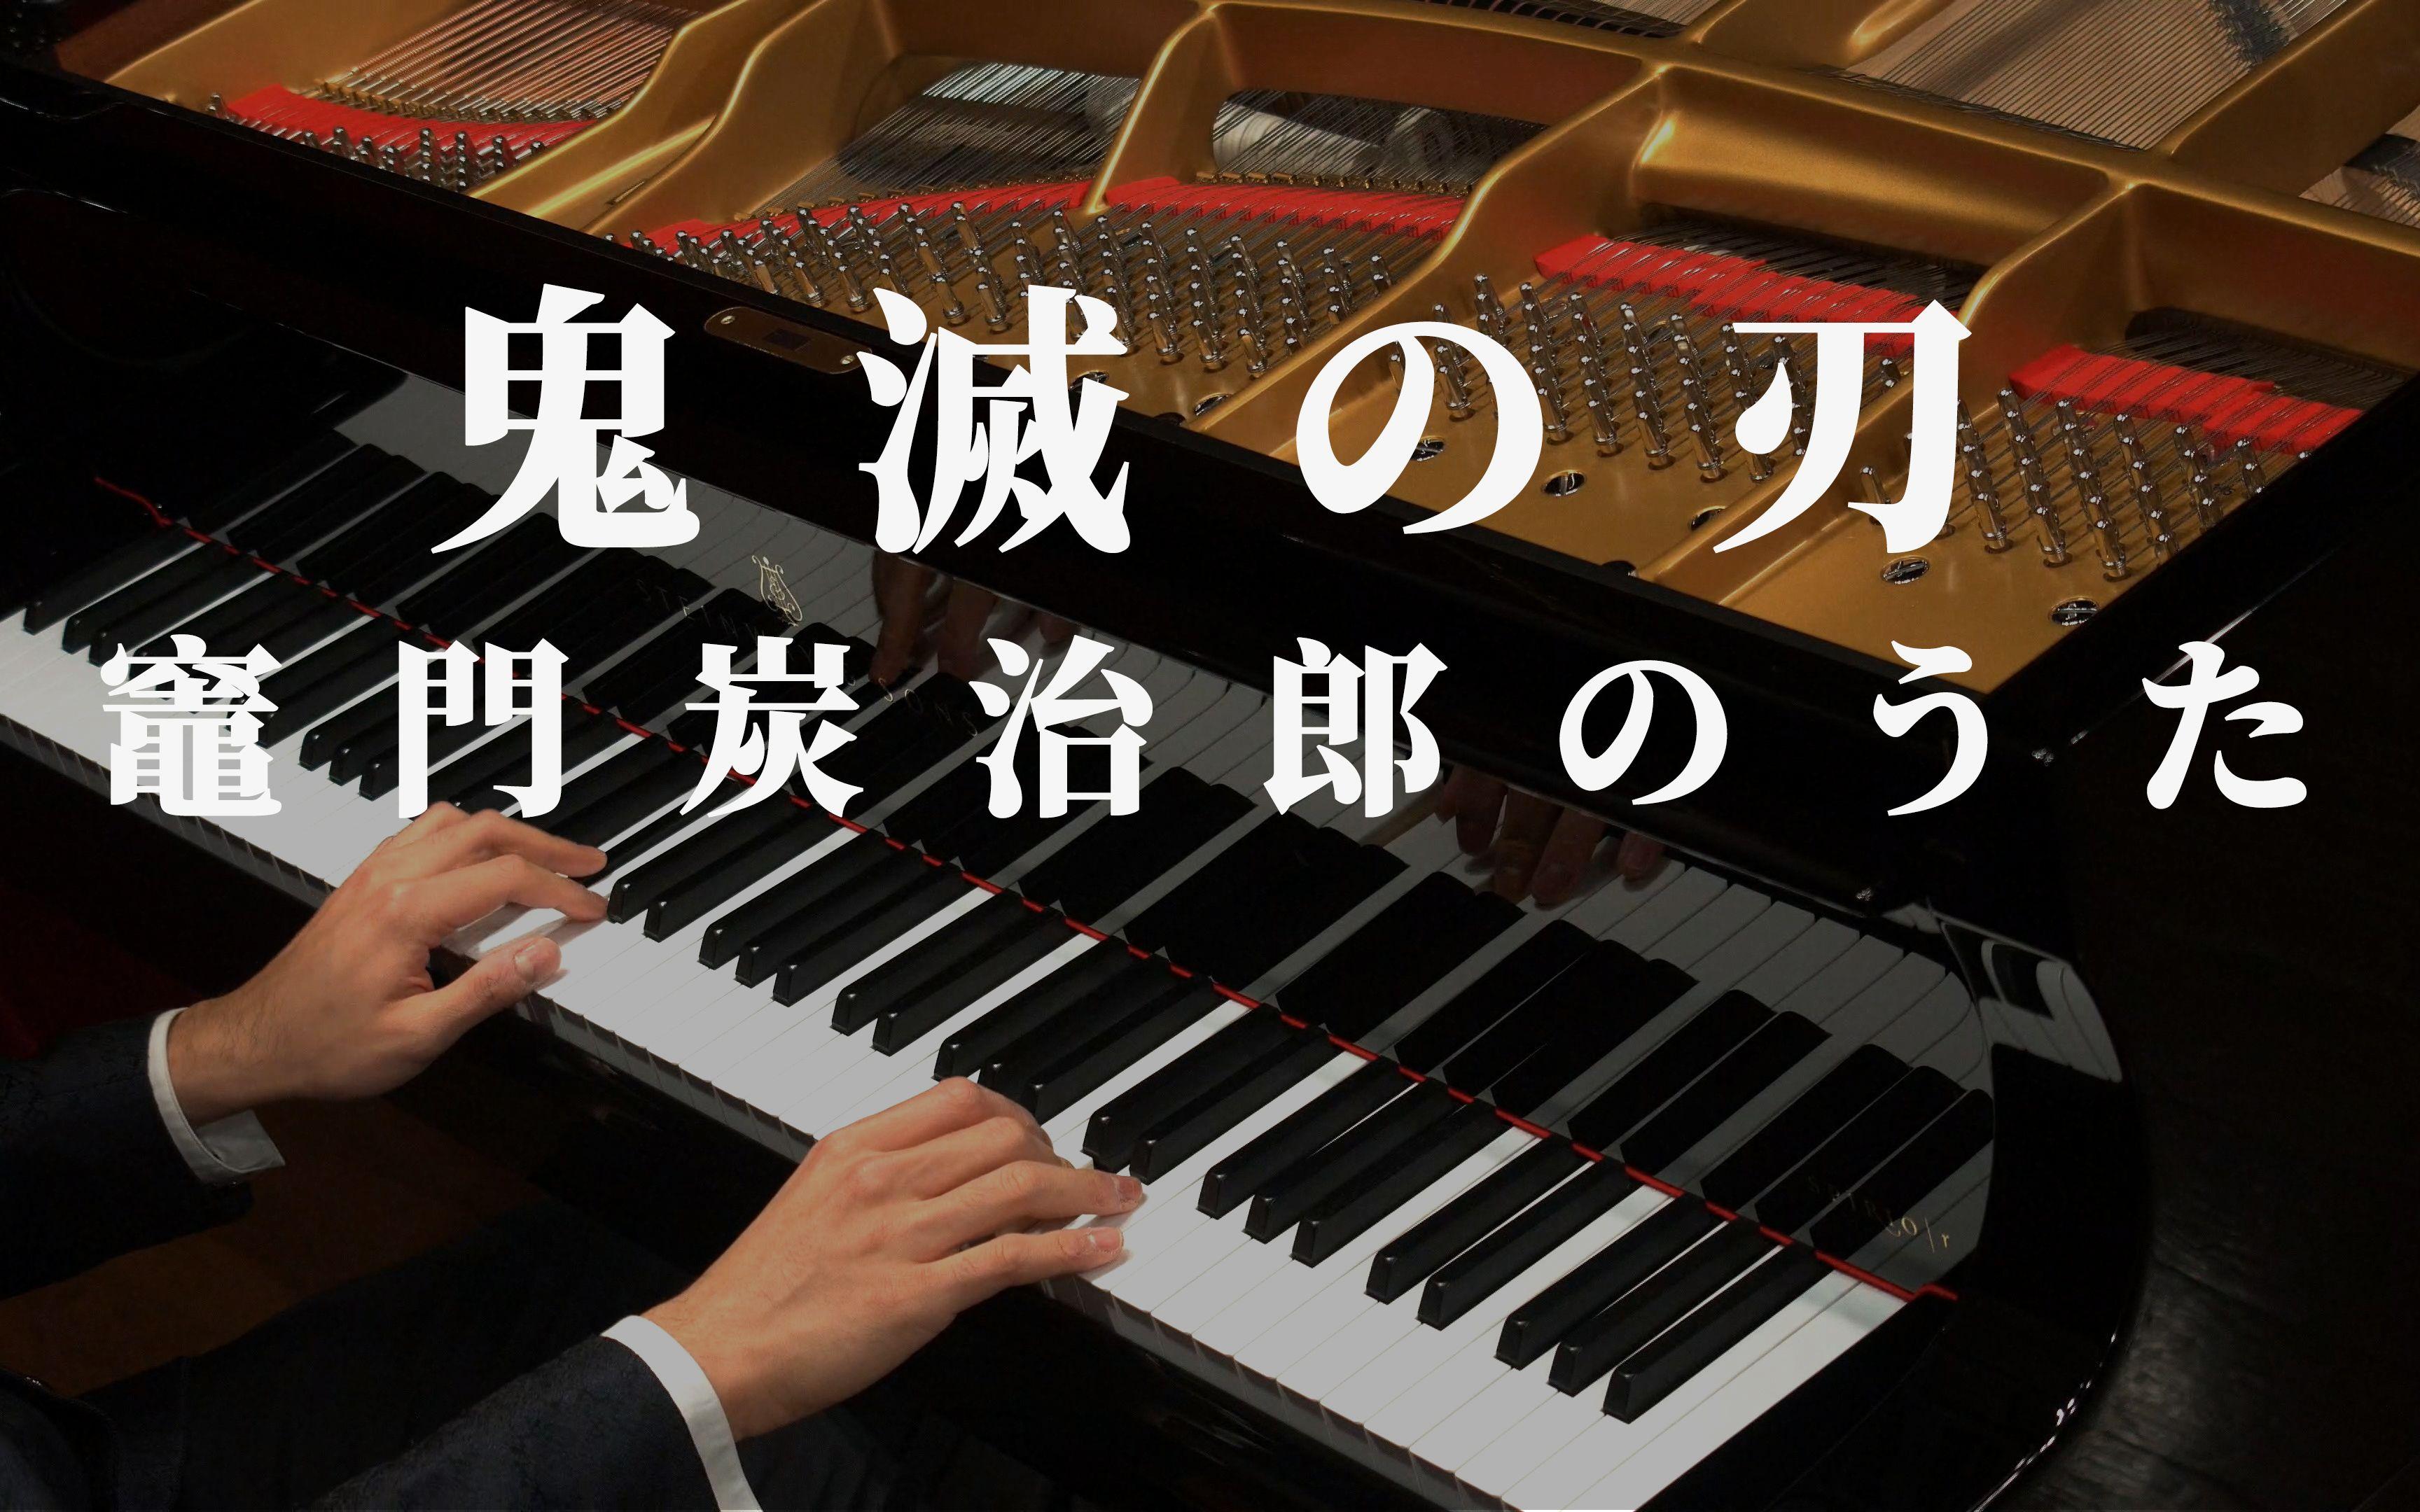 【Animenz】灶门炭治郎之歌 – 鬼灭之刃 OST 钢琴版_哔哩哔哩 (゜-゜)つロ 干杯~-bilibili